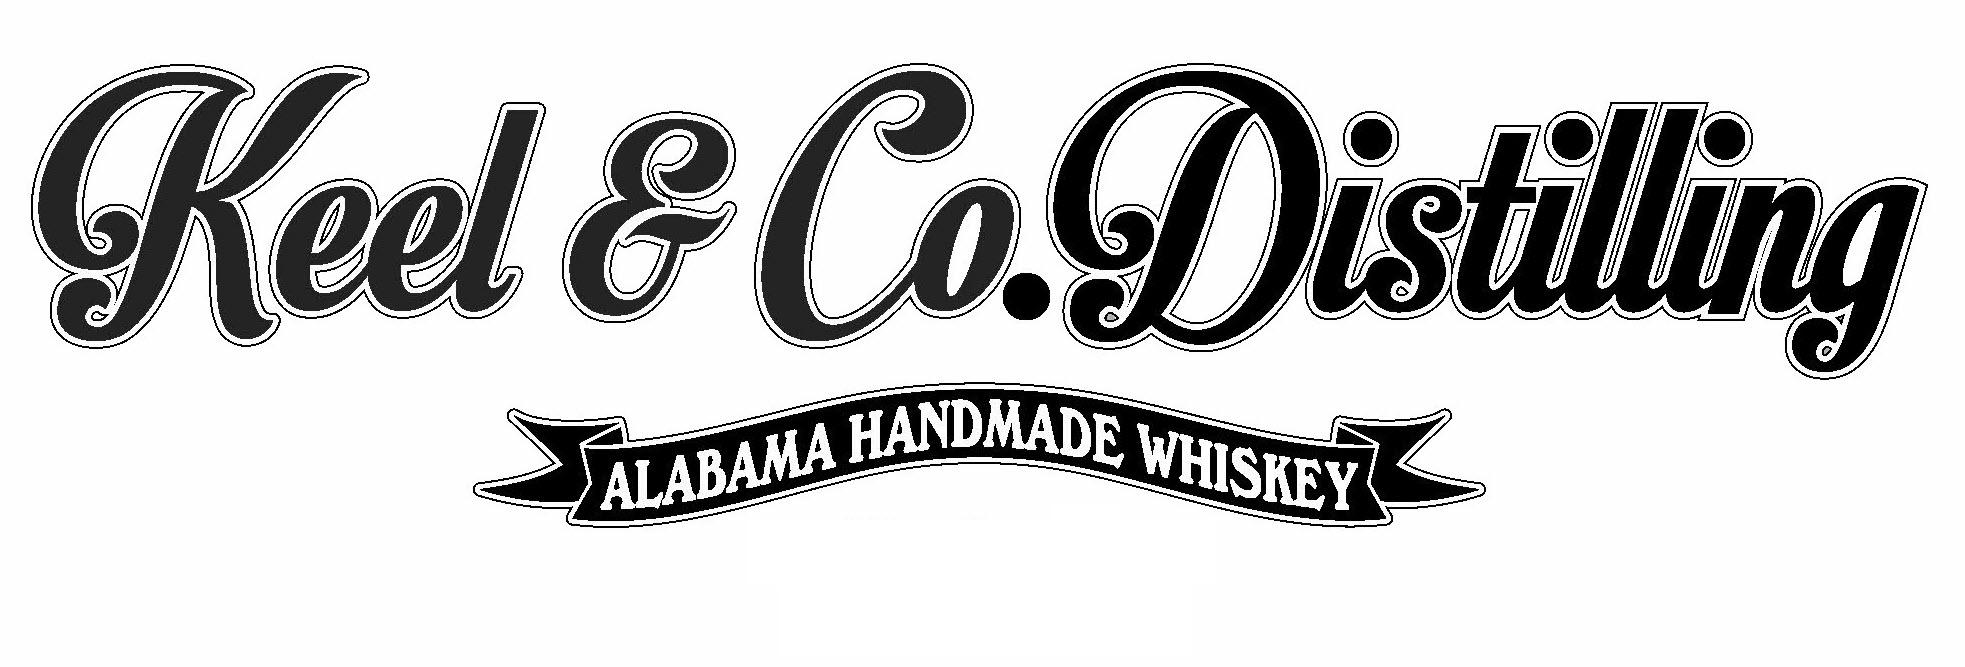 Gibson Distilling Logo and address info - Headland Alabama